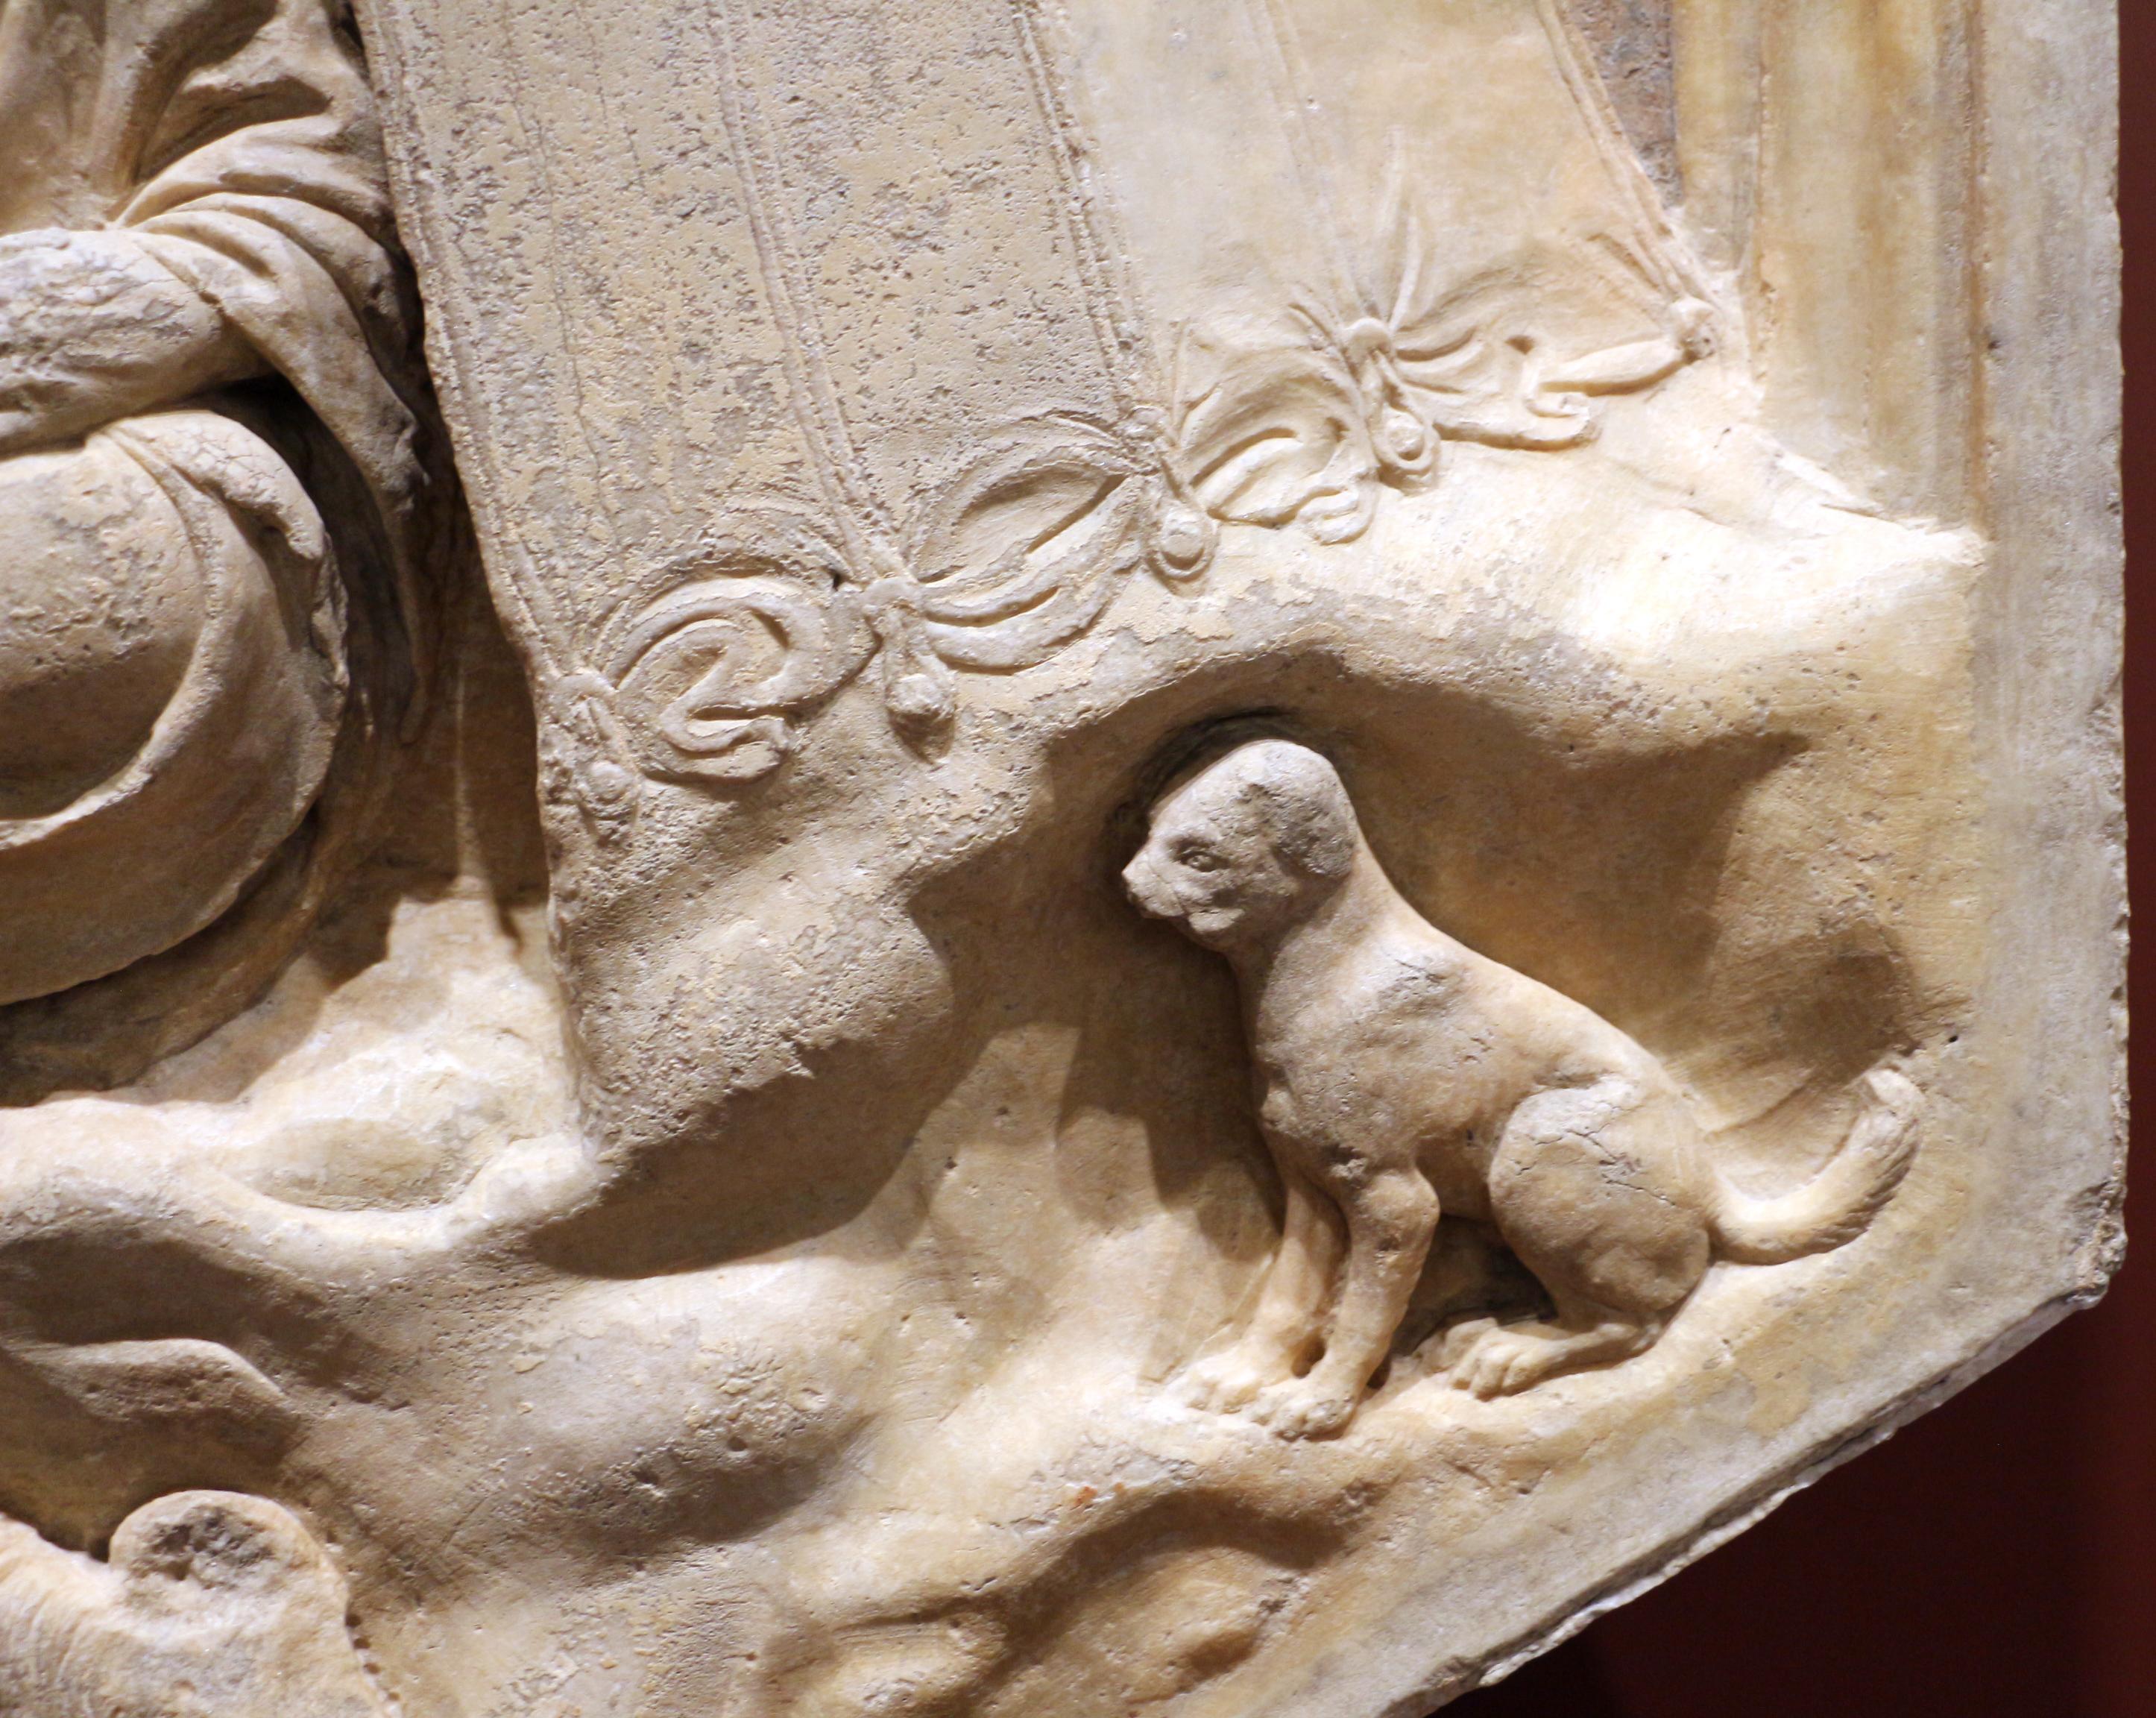 File:Andrea o nino pisano, jabal ovvero la pastorizia, 1334-43,